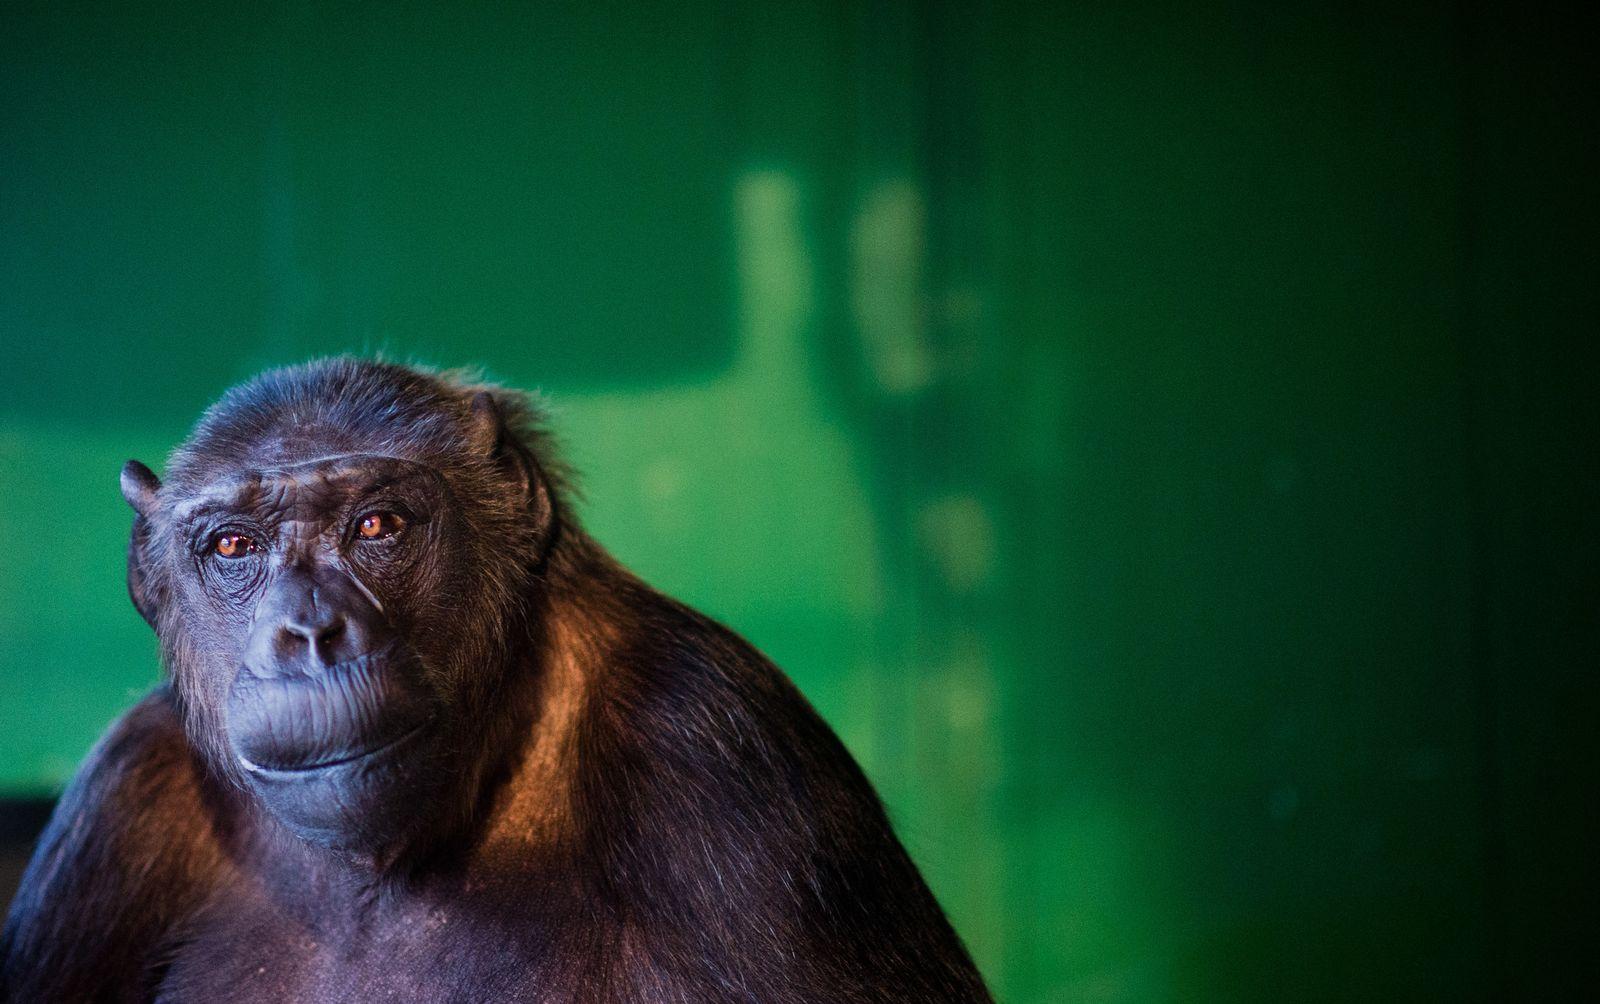 Zirkus-Schimpanse Robby